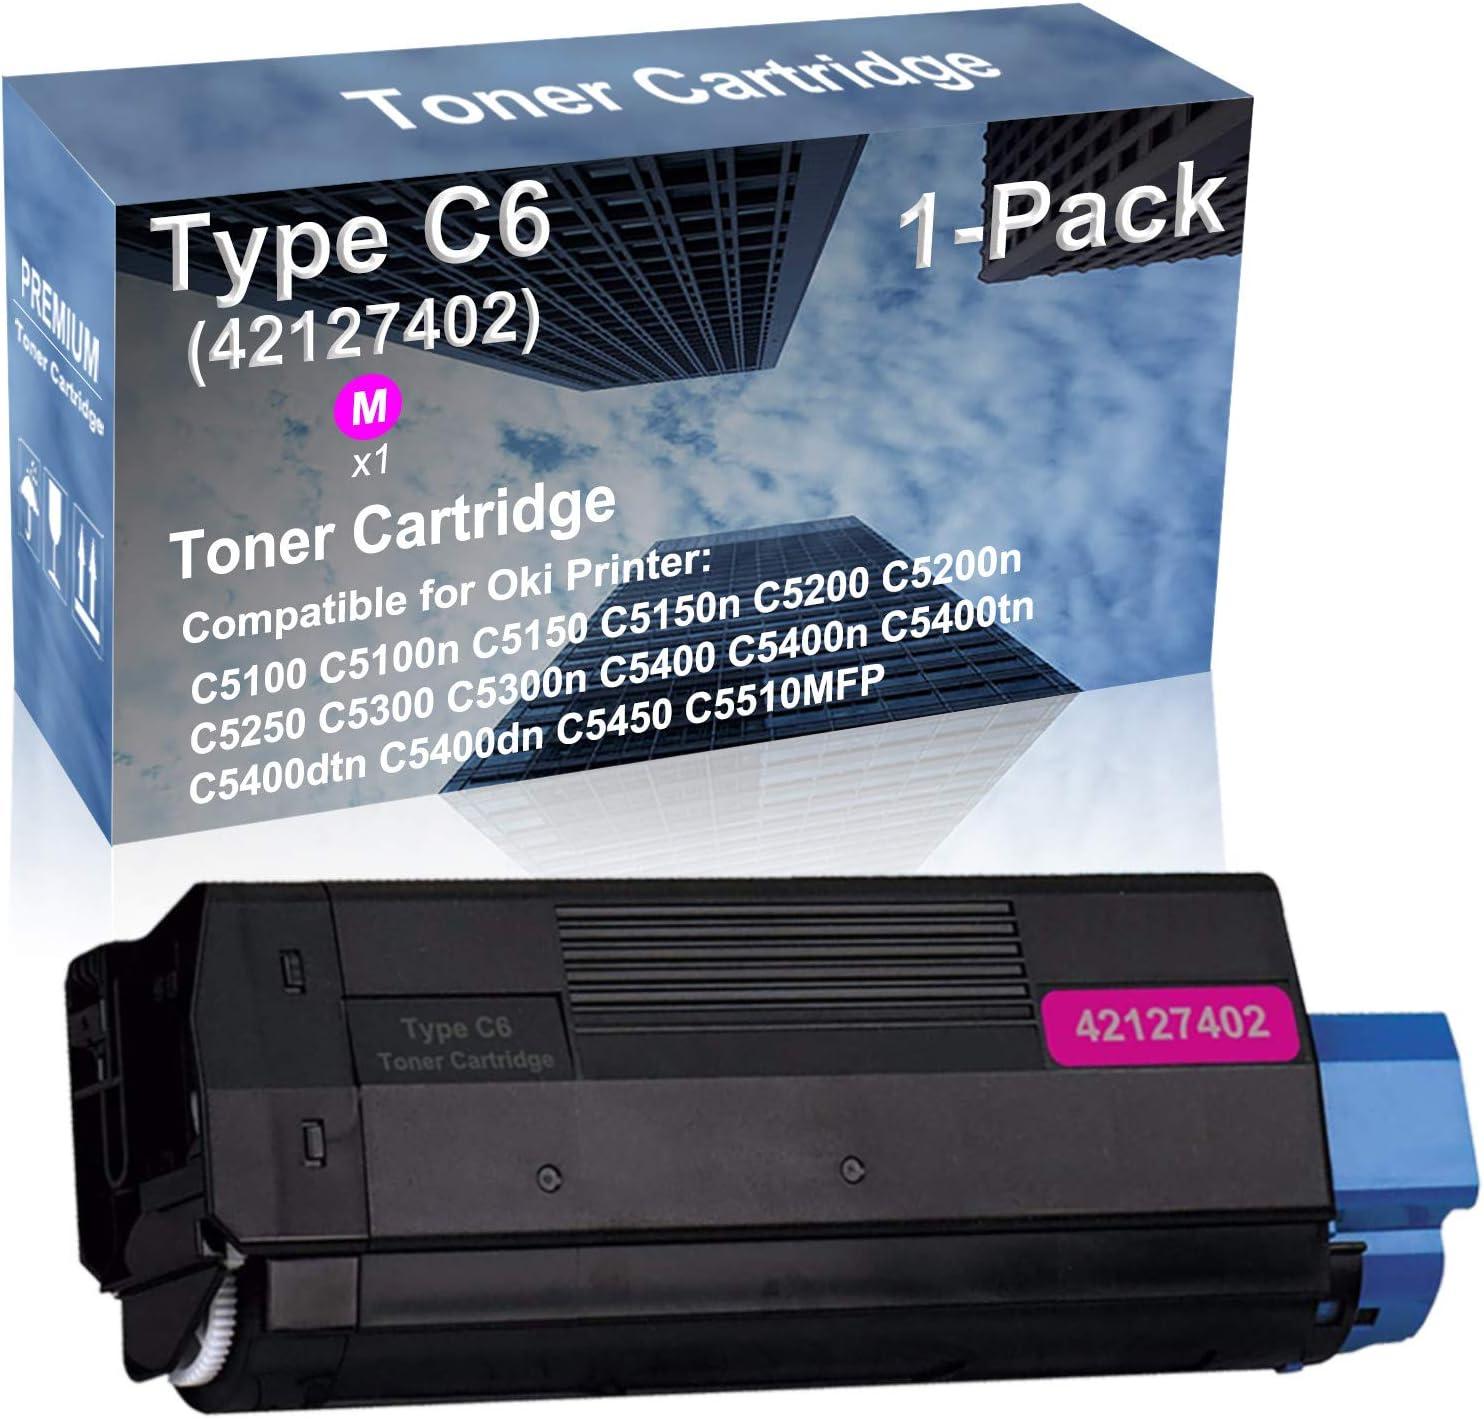 1-Pack (Magenta) Compatible High Yield Type C6 (42127402) Laser Printer Toner Cartridge Used for OKI C5400dtn C5400dn C5450 C5510MFP Printer